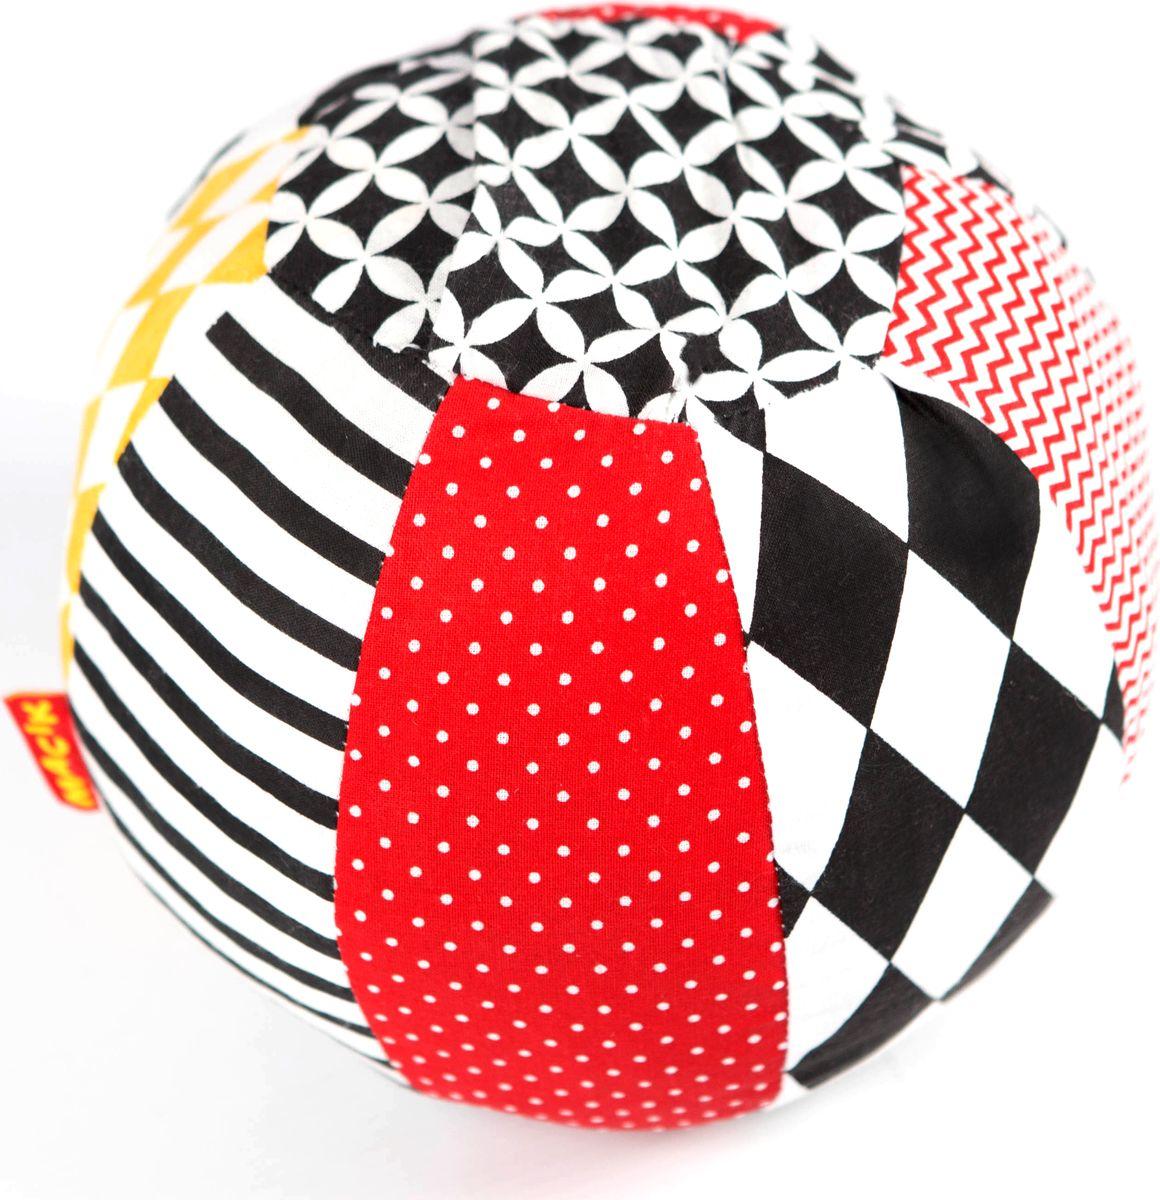 Macik Погремушка-мячик Black & White погремушка macik треугольник с колечками mkp 1601 03